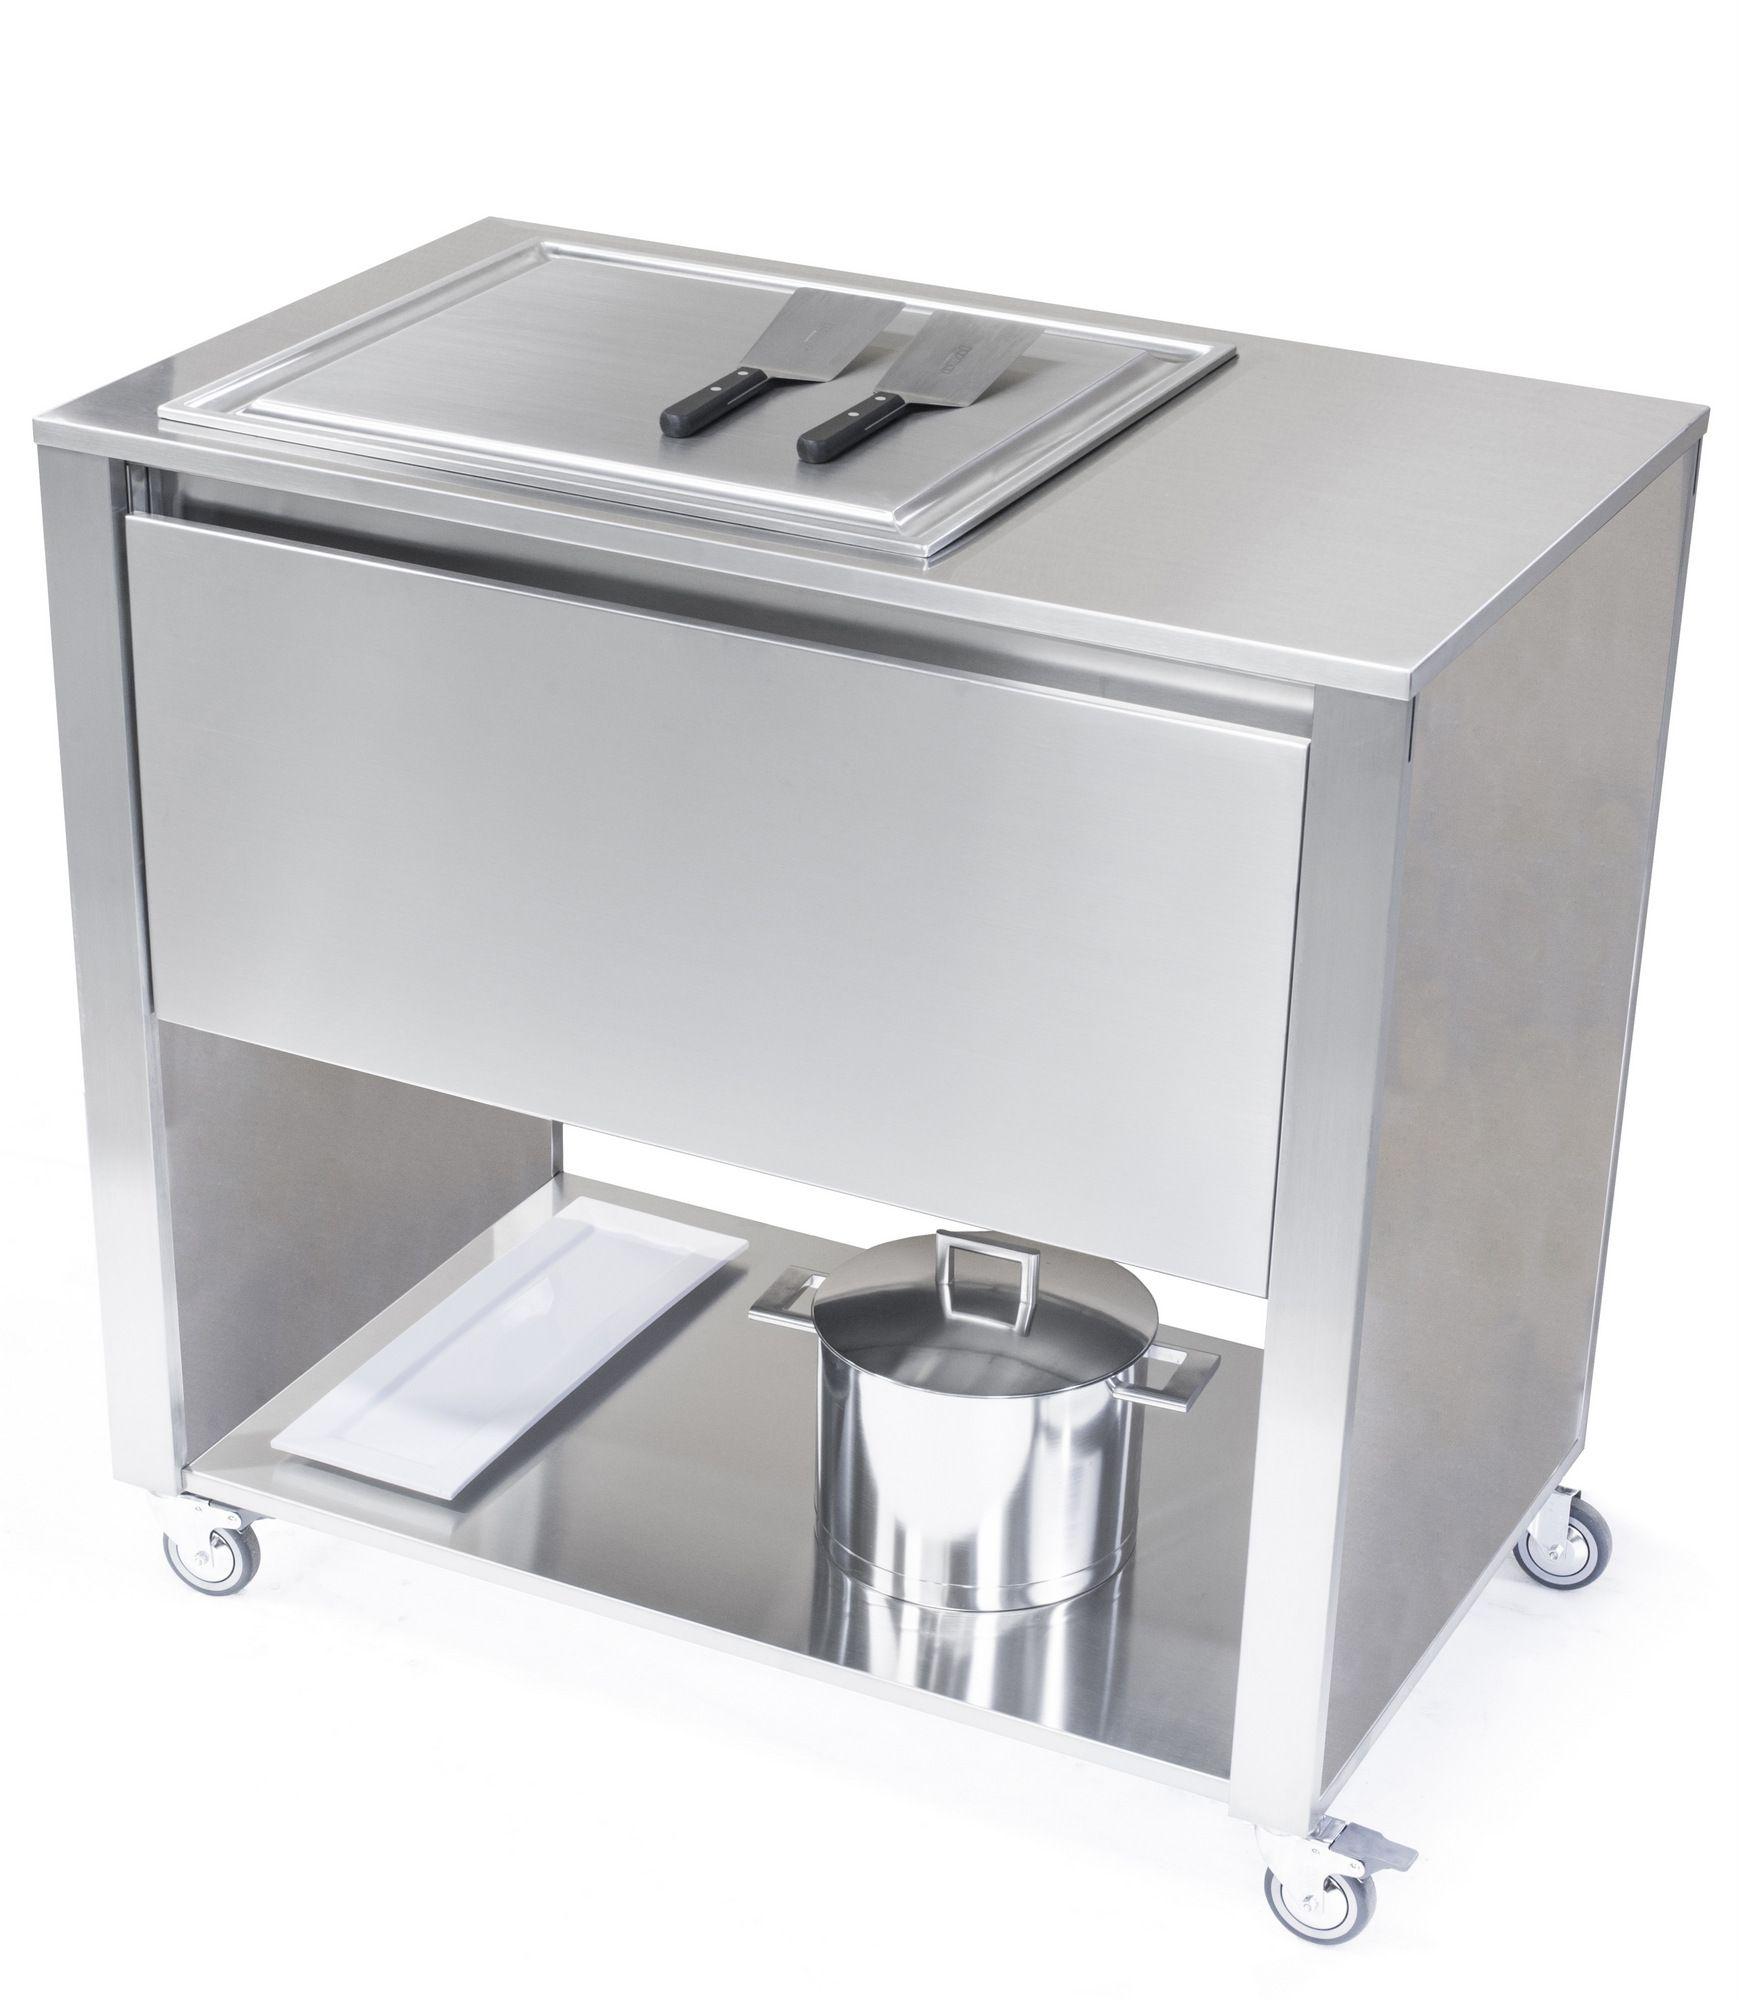 669212 modulo cucina freestanding collezione cun by jokodomus - Cucina freestanding prezzi ...